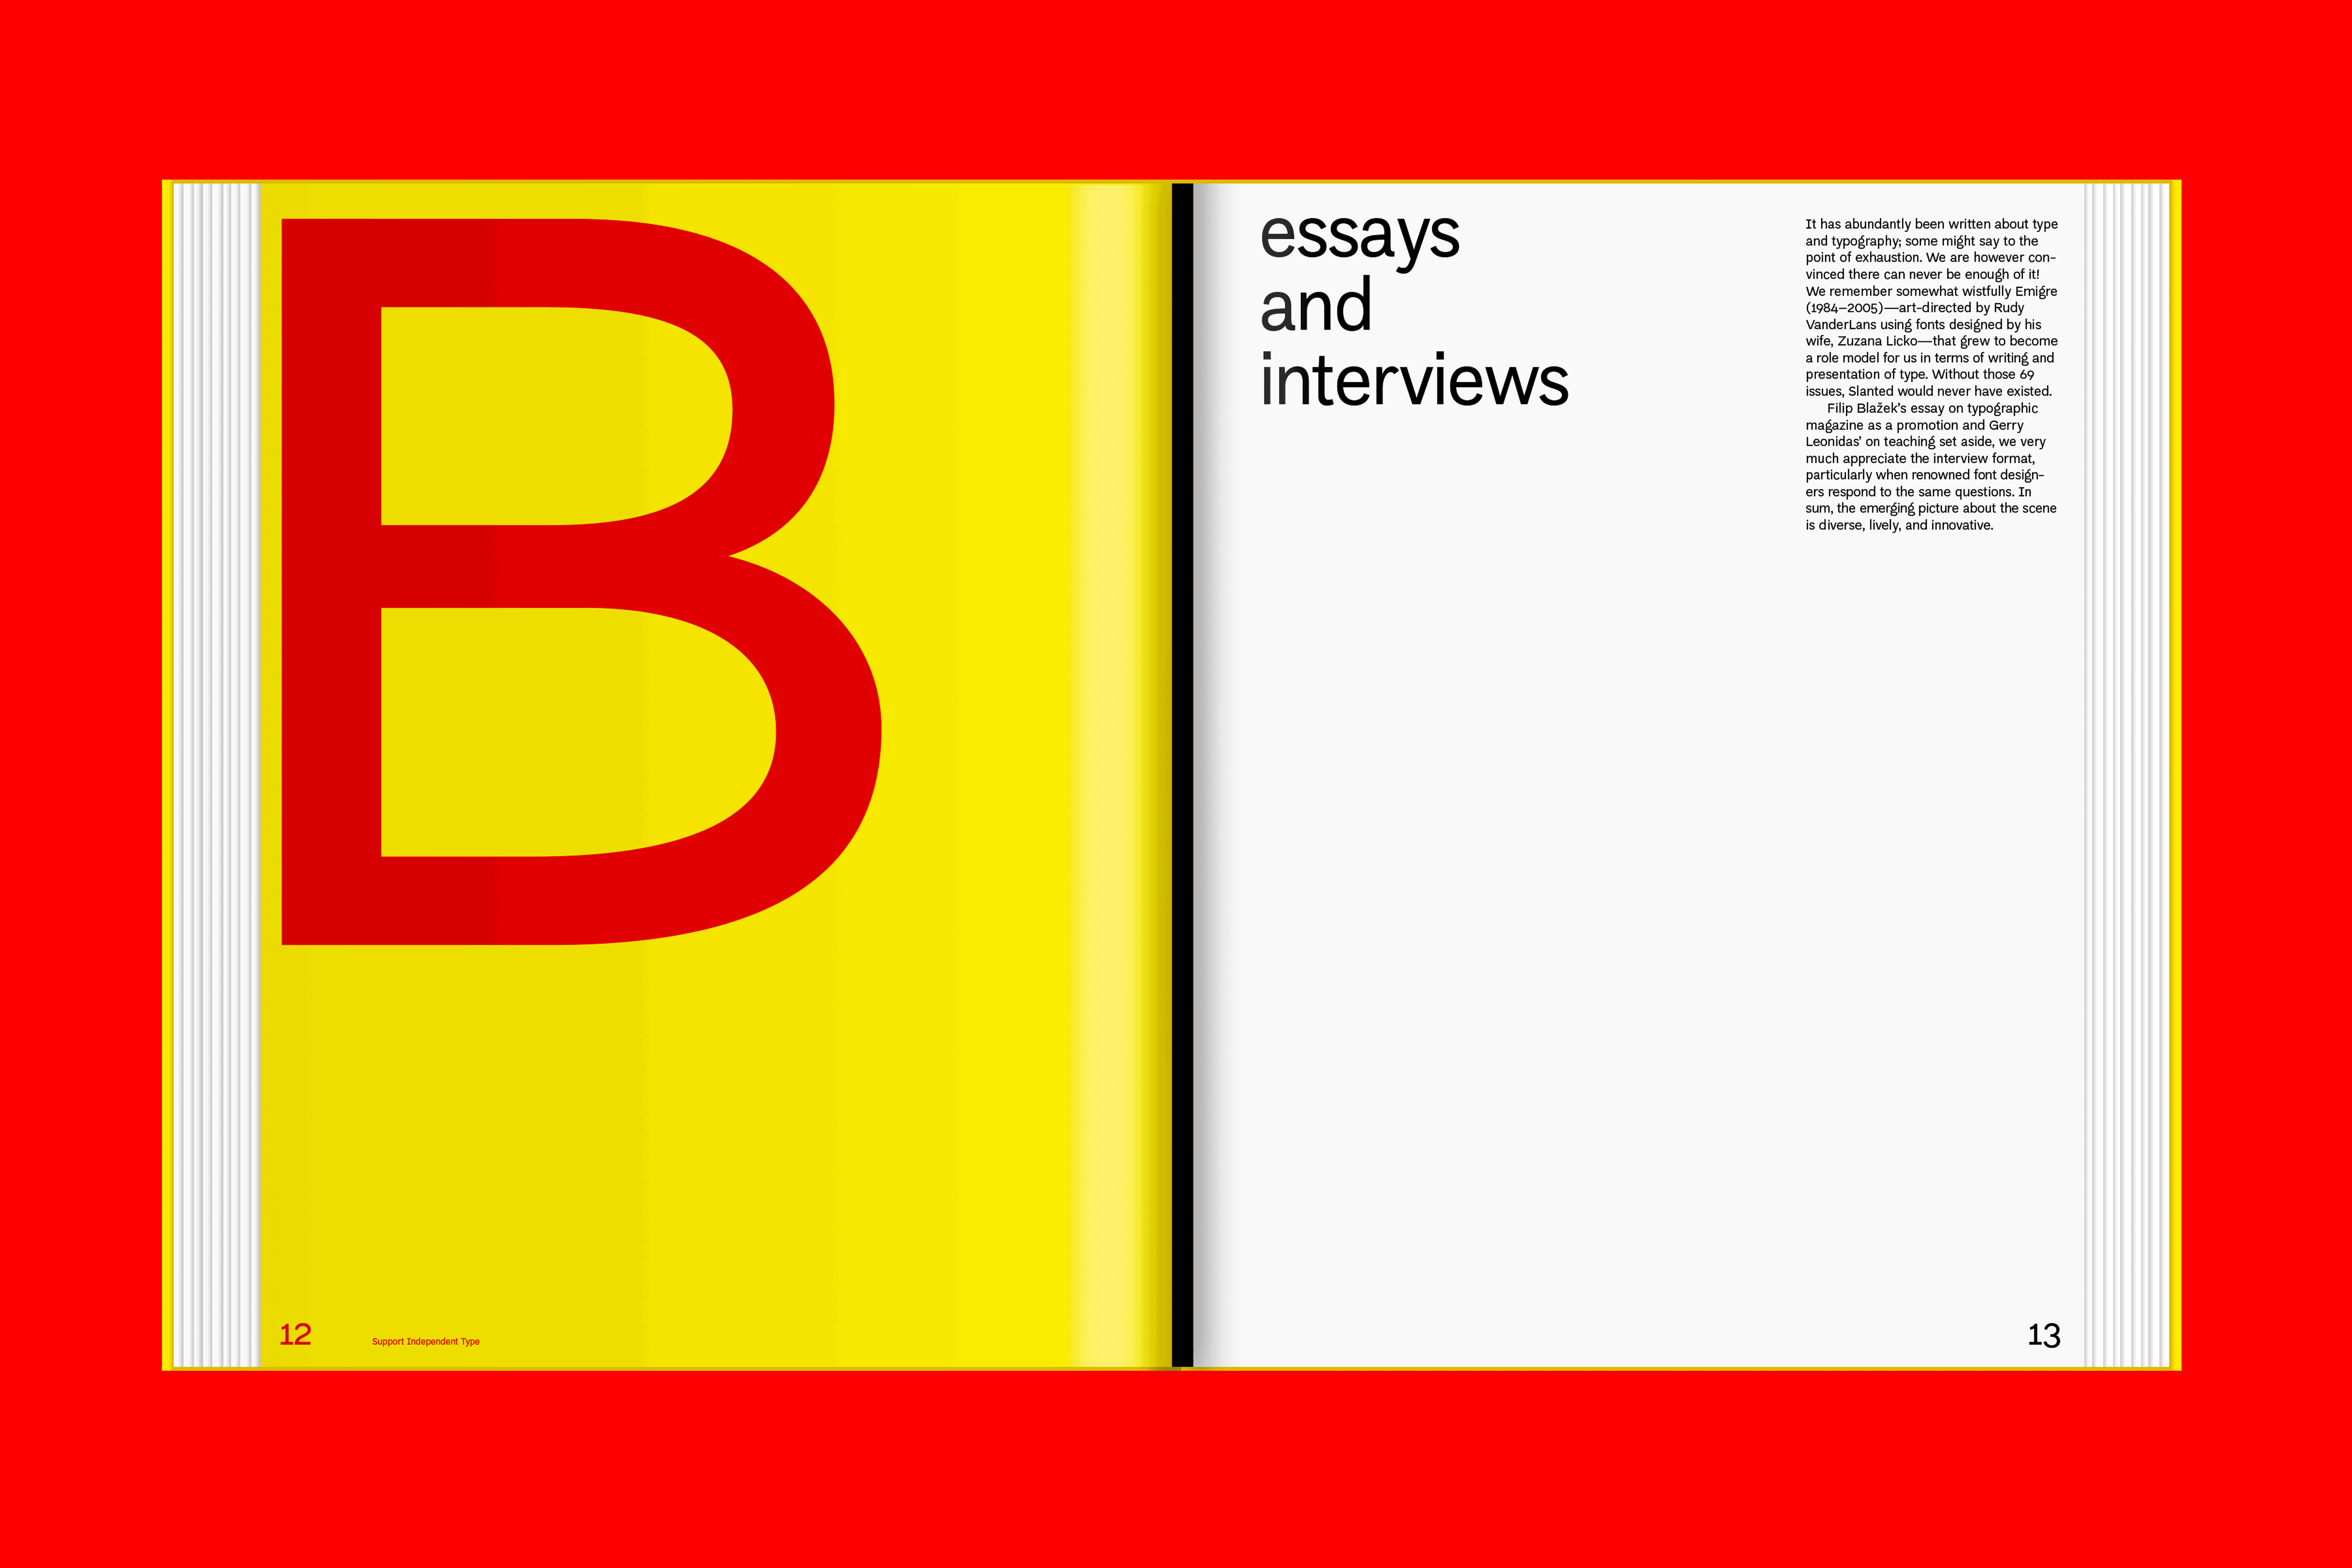 Slanted-Publiaktionen-Slanted-Publishers-Support-Independent-Type_06